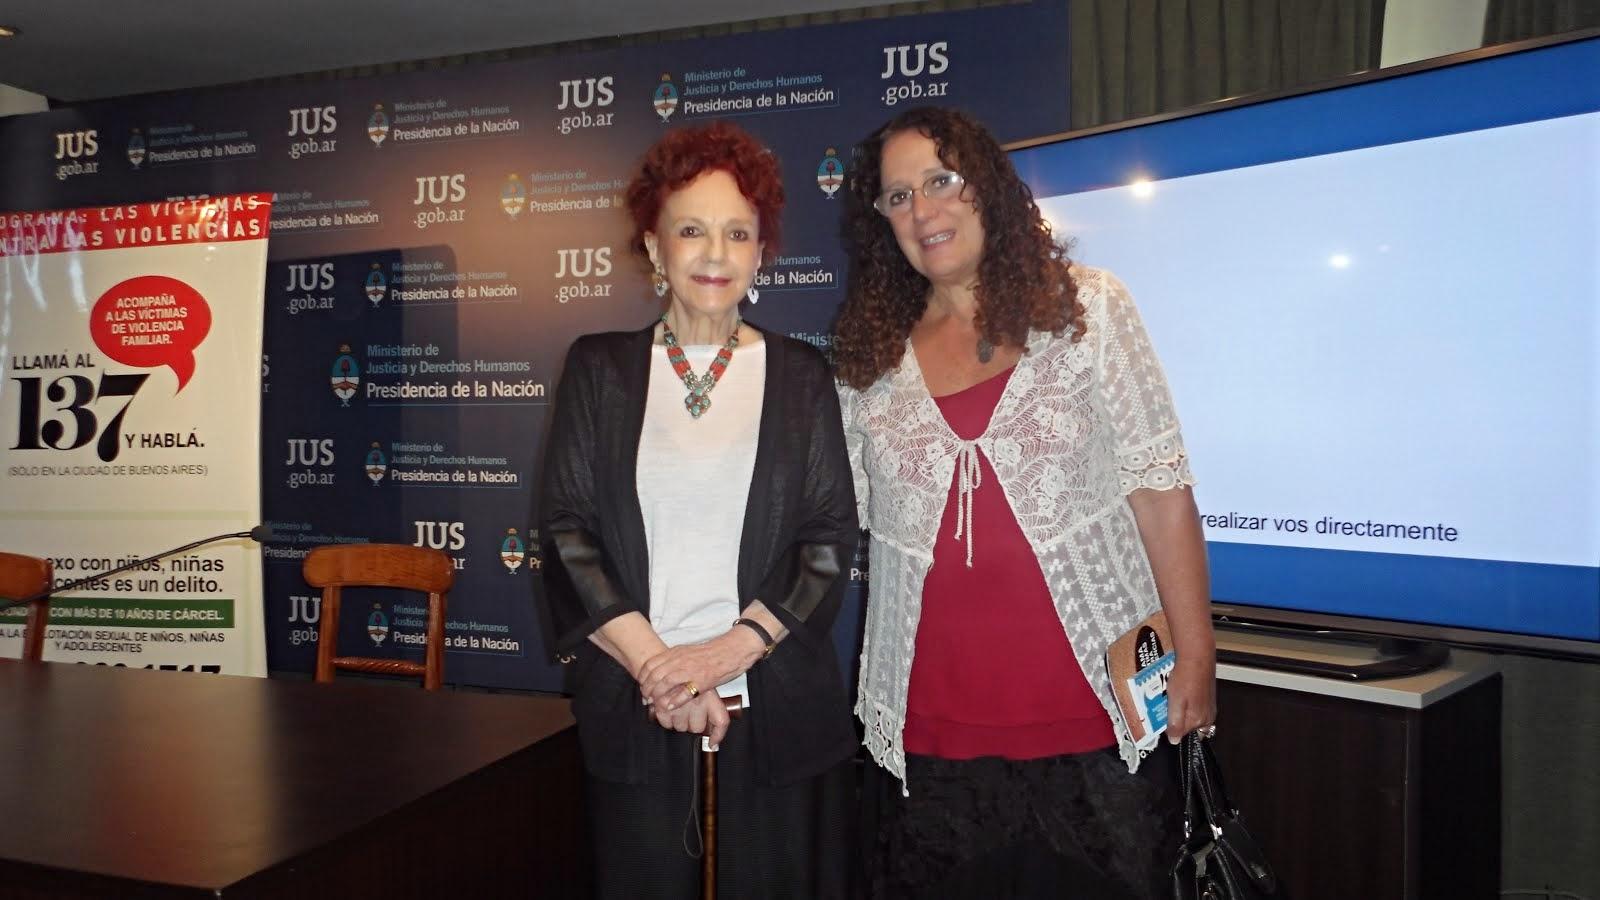 Maria Elena Naddeo y Eva Giberti